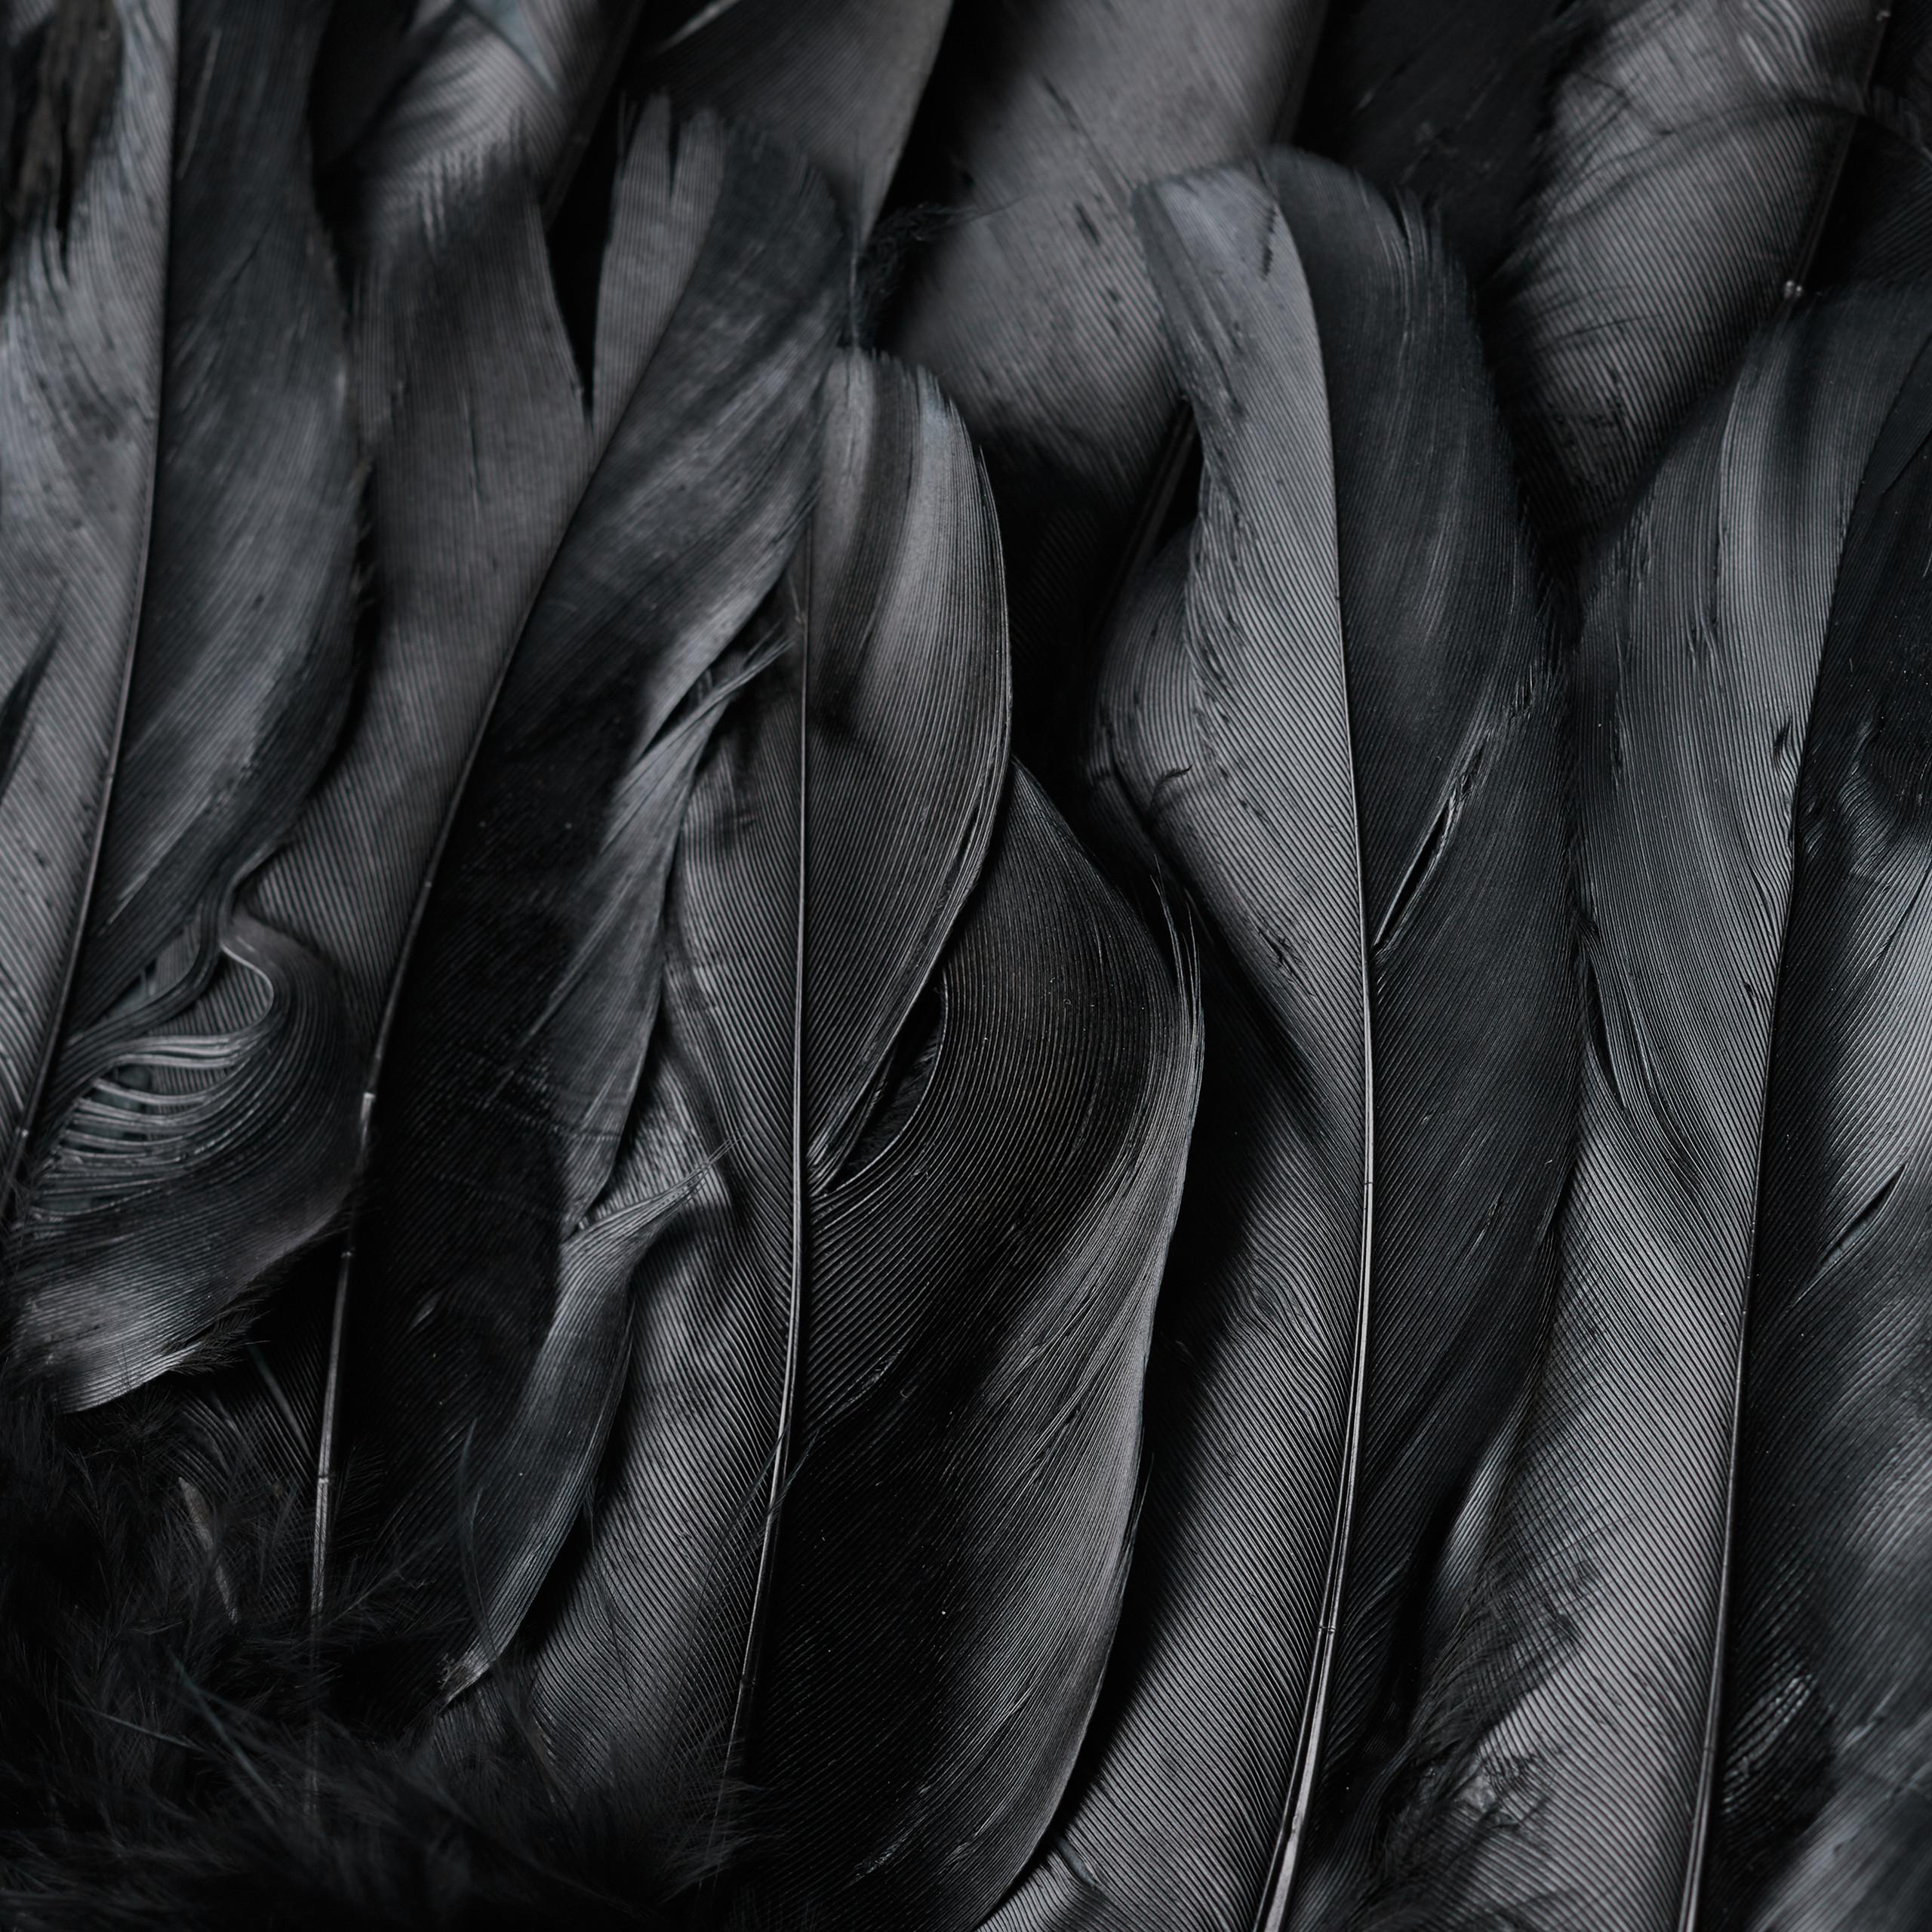 vleugels-verkleedkleding-XXL-engelenvleugels-engelkostuum-kunstveren miniatuur 15